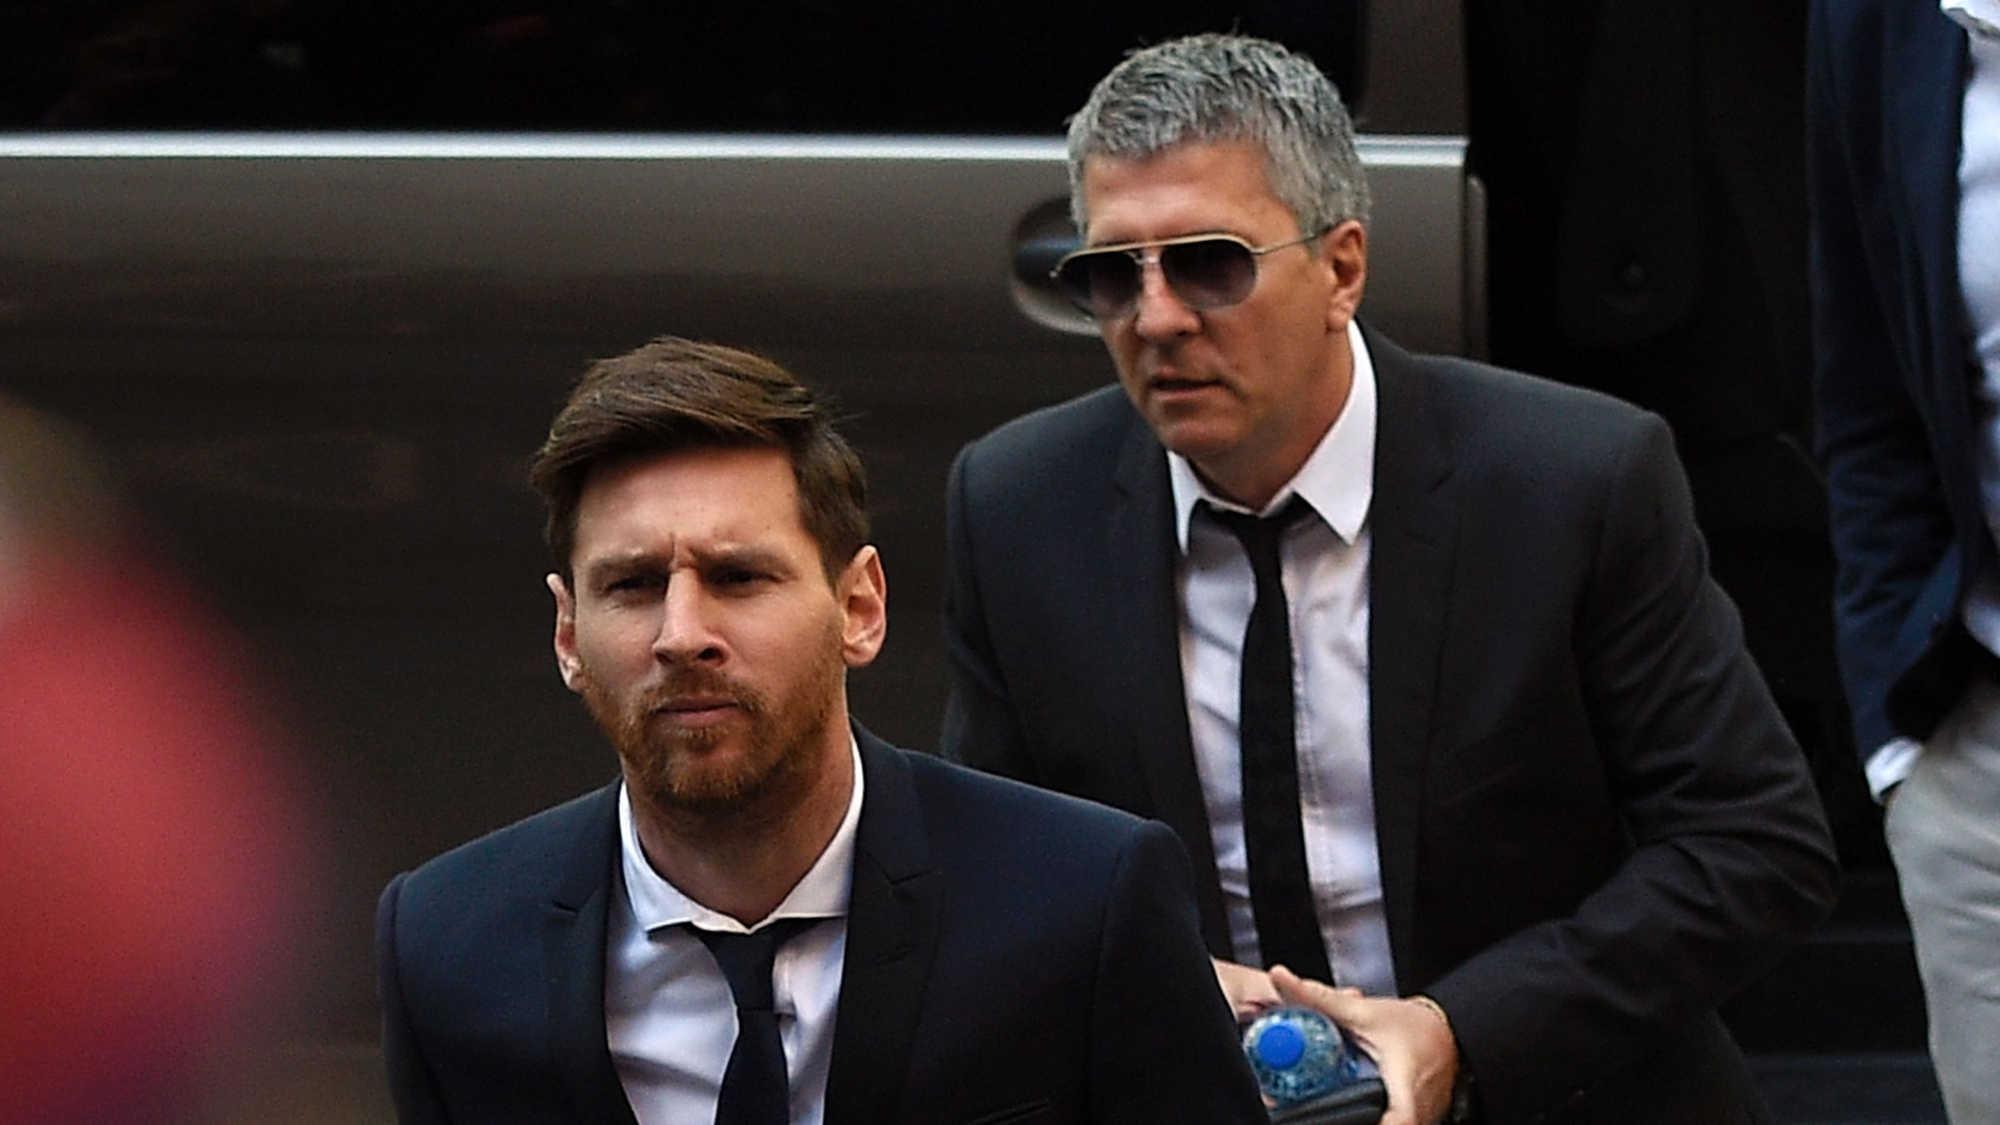 mesi-father-1000 Ντριπλάροντας την εφορία - Πώς ξεγλιστρούν οι παγκόσμιοι αστέρες του ποδοσφαίρου